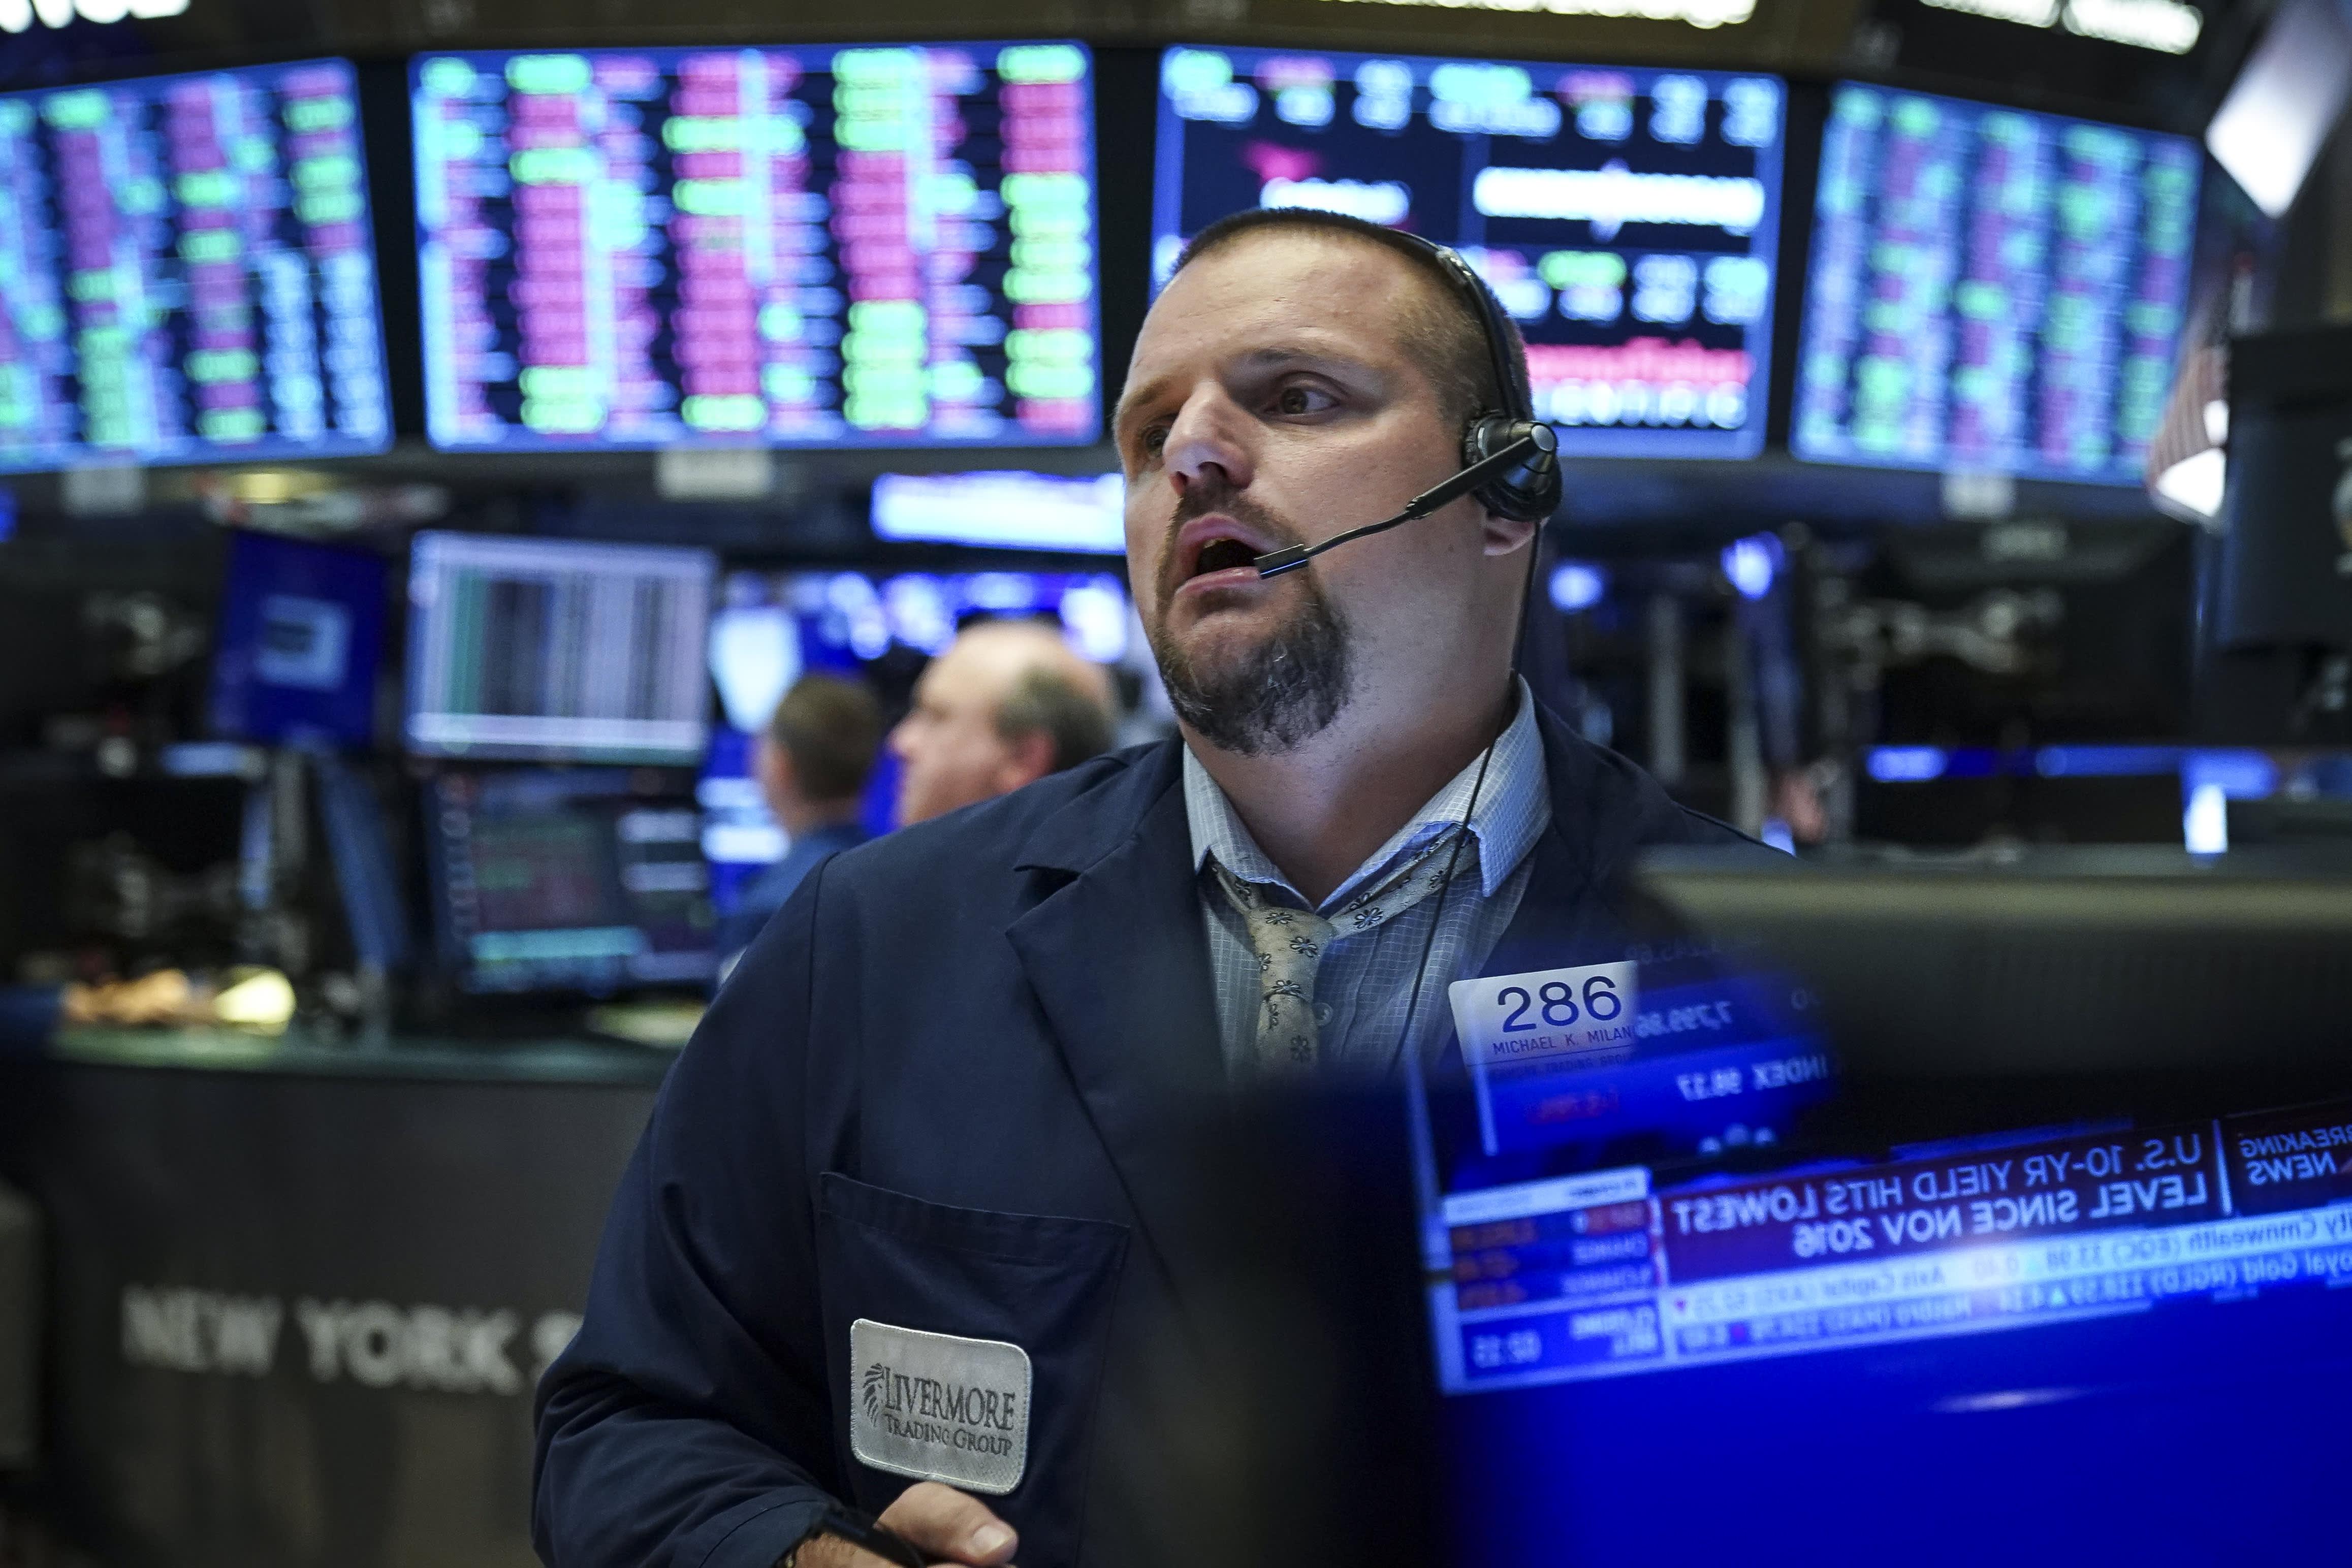 Stocks making the biggest moves premarket: Twitter, Boeing, Spark, Boston Beer, Snap & more